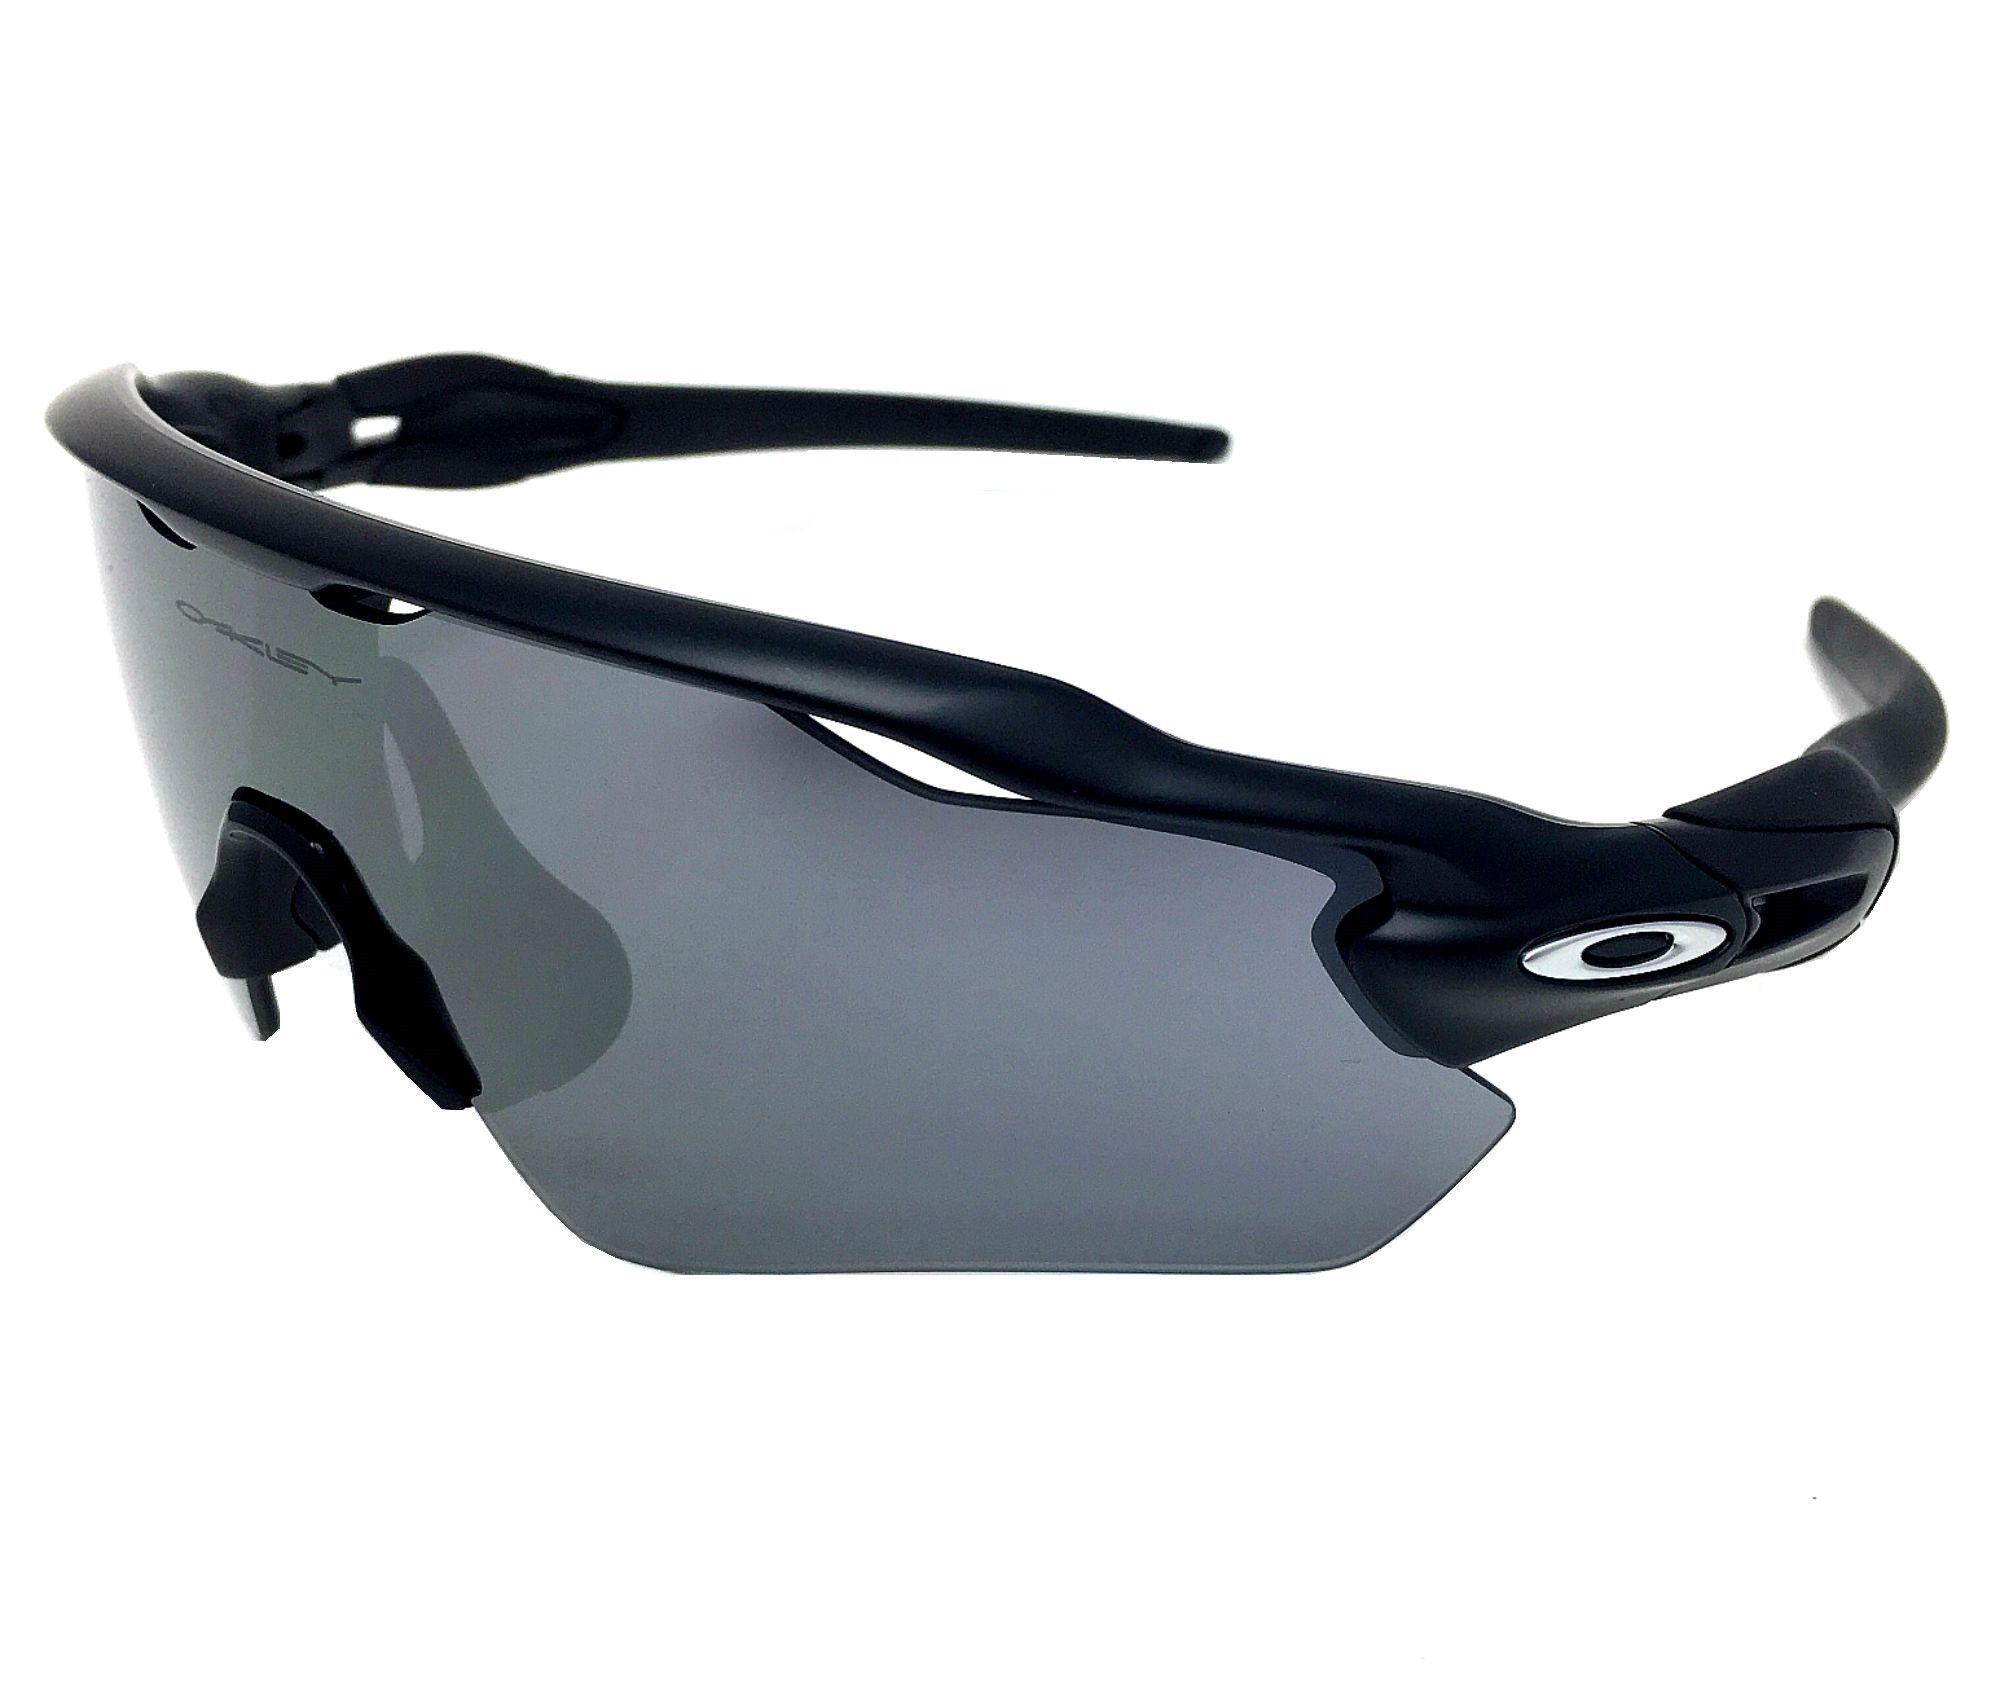 c9fd312826 Oakley Radar Path EV 9208-01 Matte Black/Black Iridium Sunglasses ...